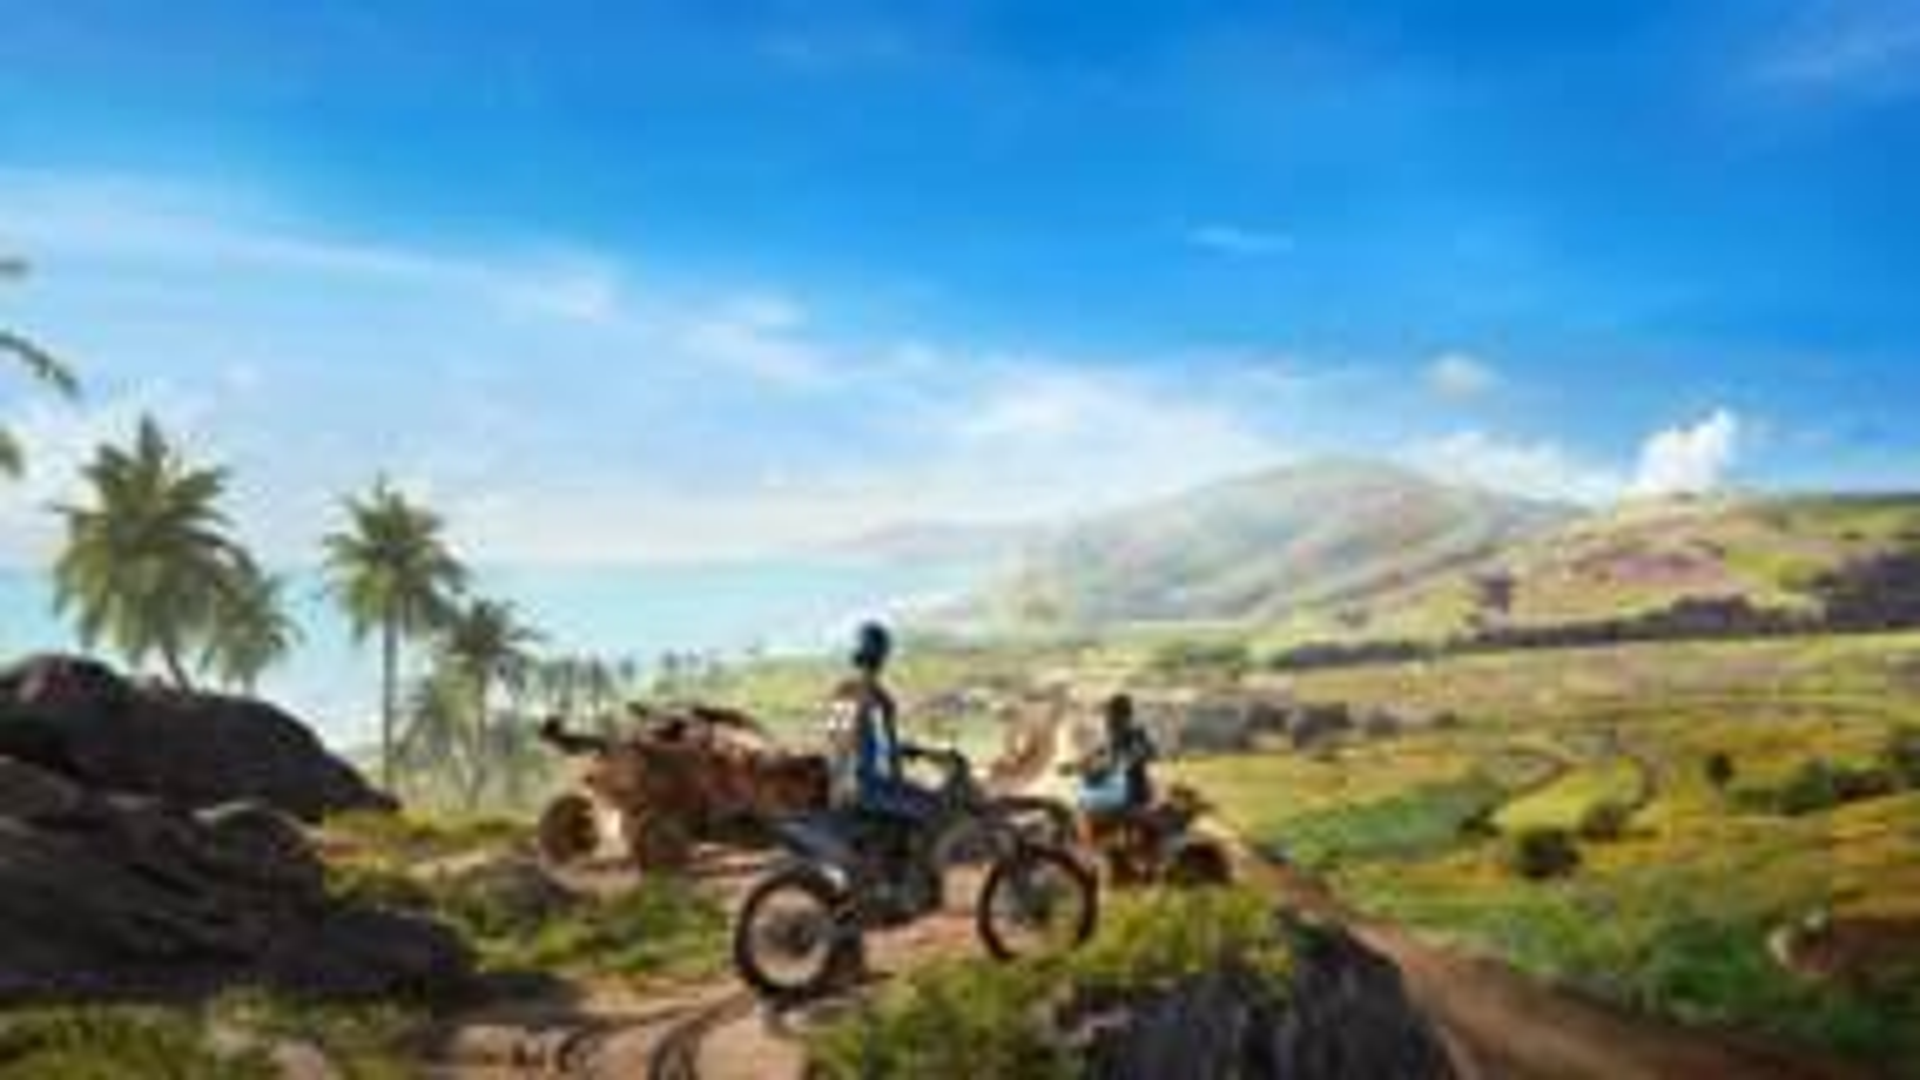 Image for MX vs ATV franchise will make its next-gen debut with MX vs ATV: Legends